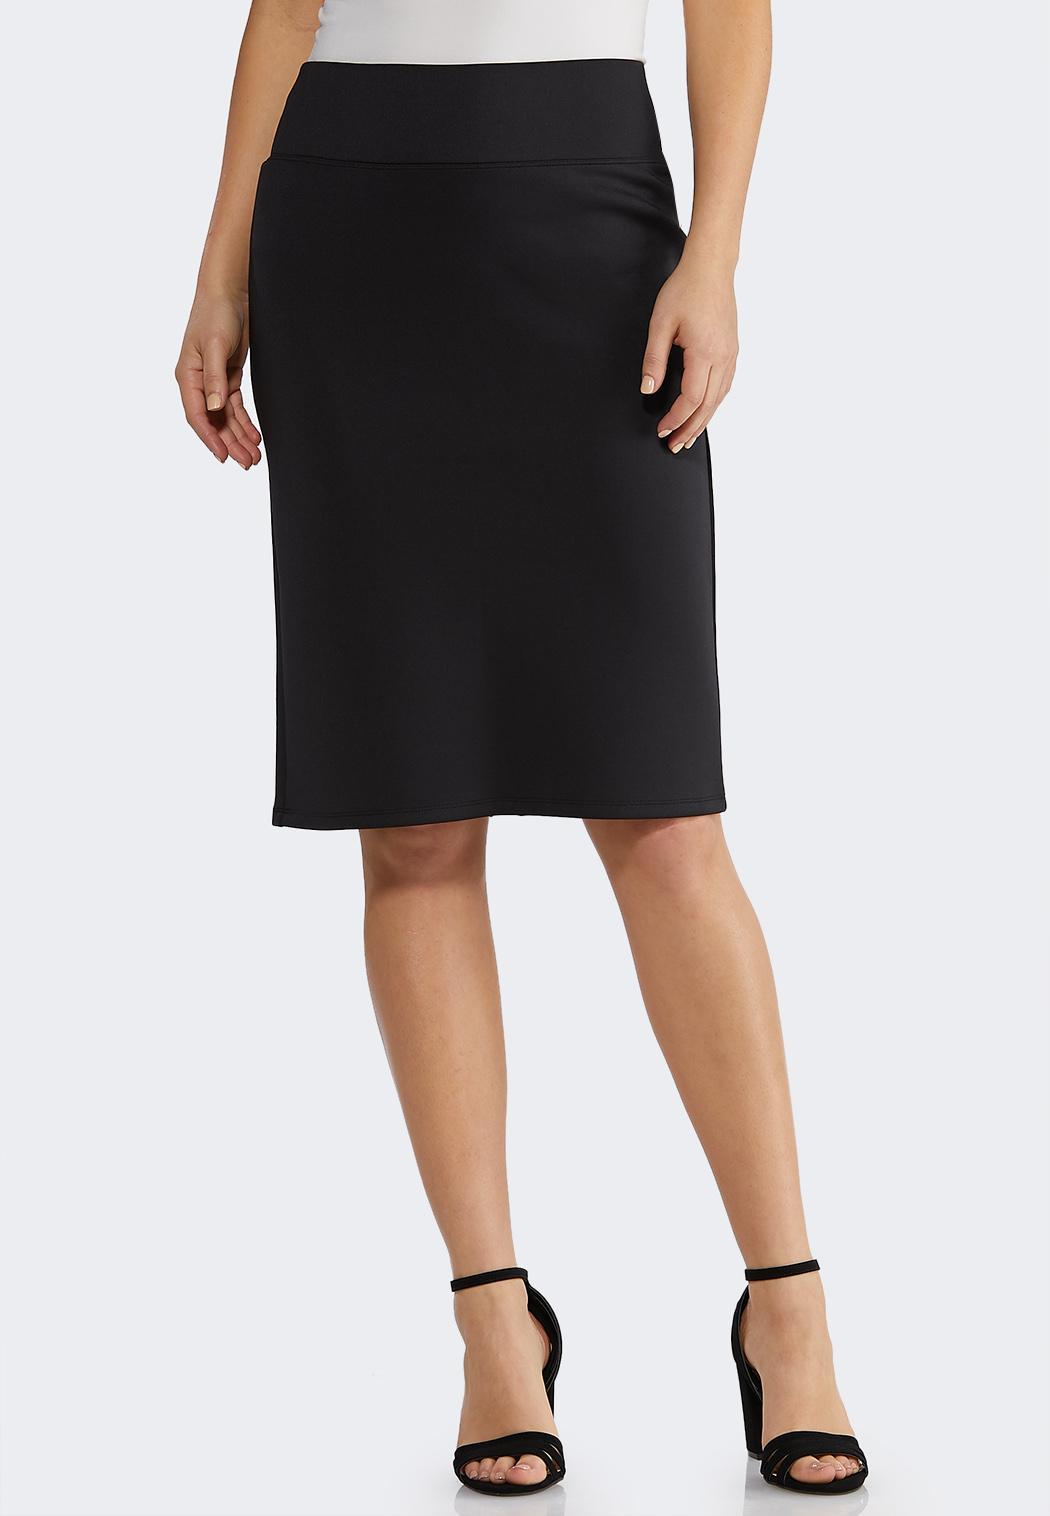 78fe624d4 Solid Scuba Pencil Skirt alternate view · Solid Scuba Pencil Skirt